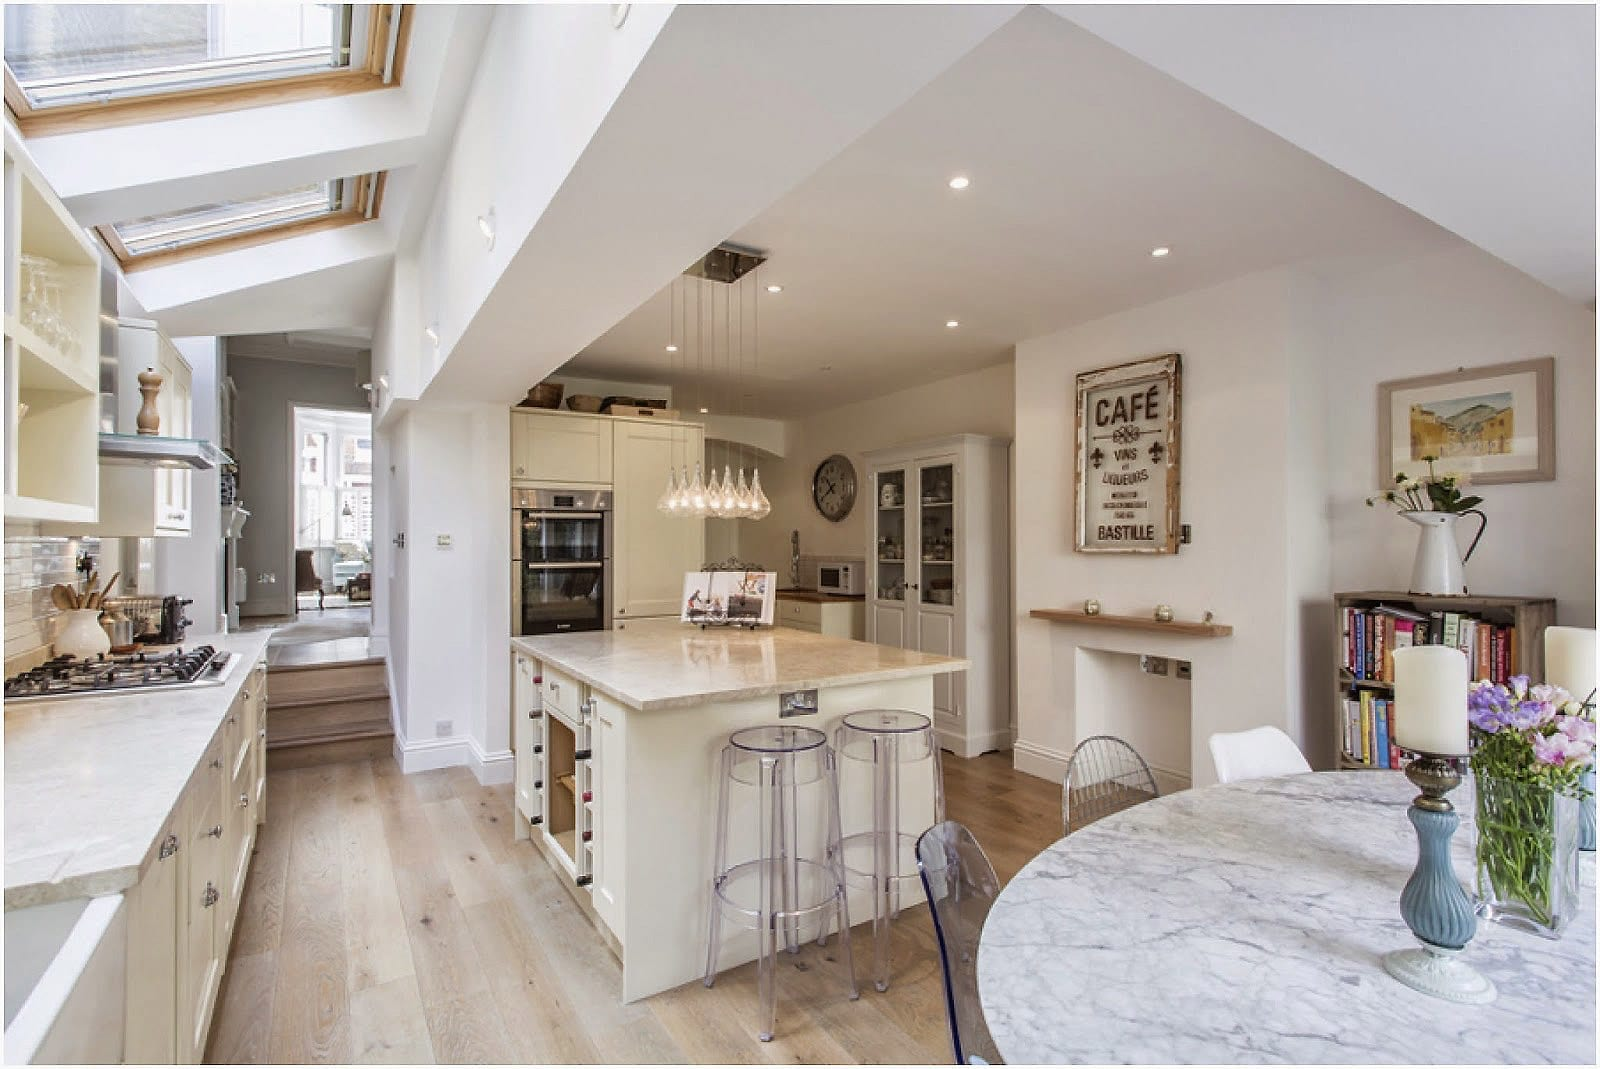 English cottage open kitchen design ideas